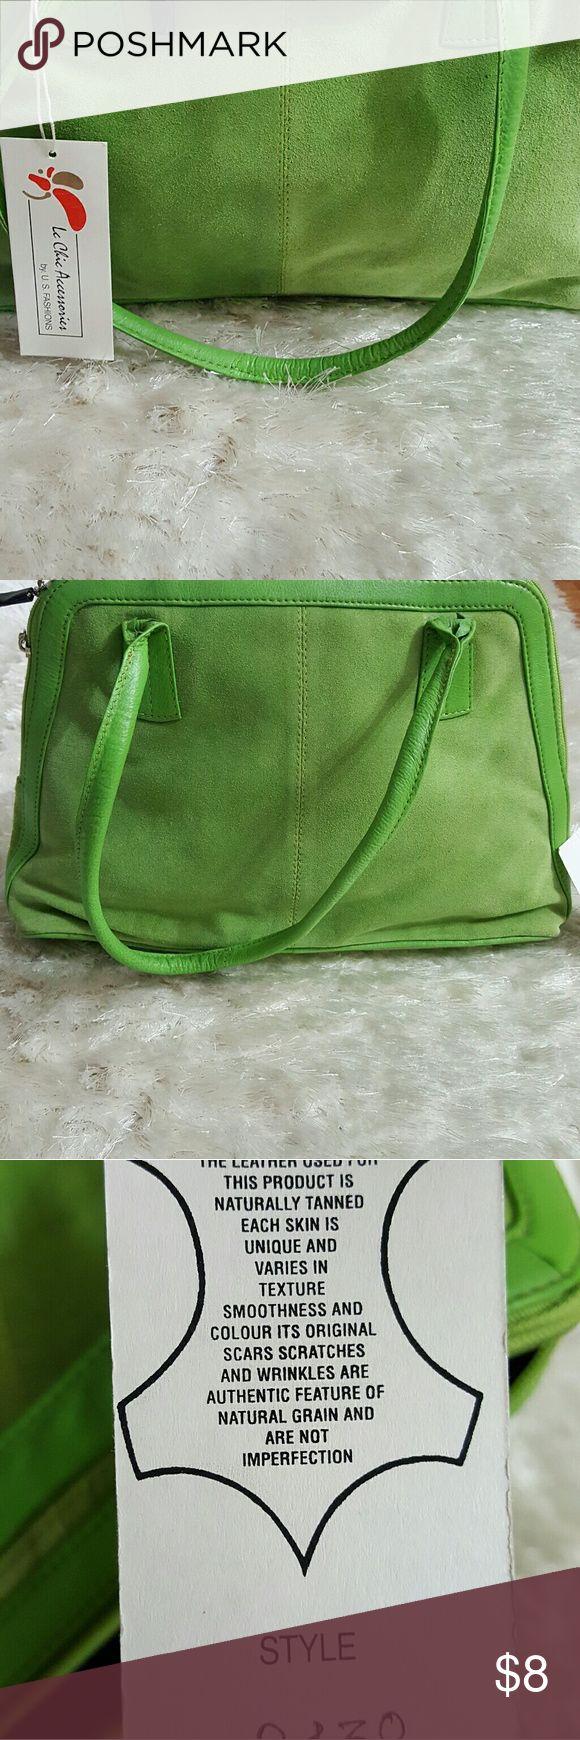 Bag New Le Chic Bags Mini Bags Fashion, Fashion design, Bags